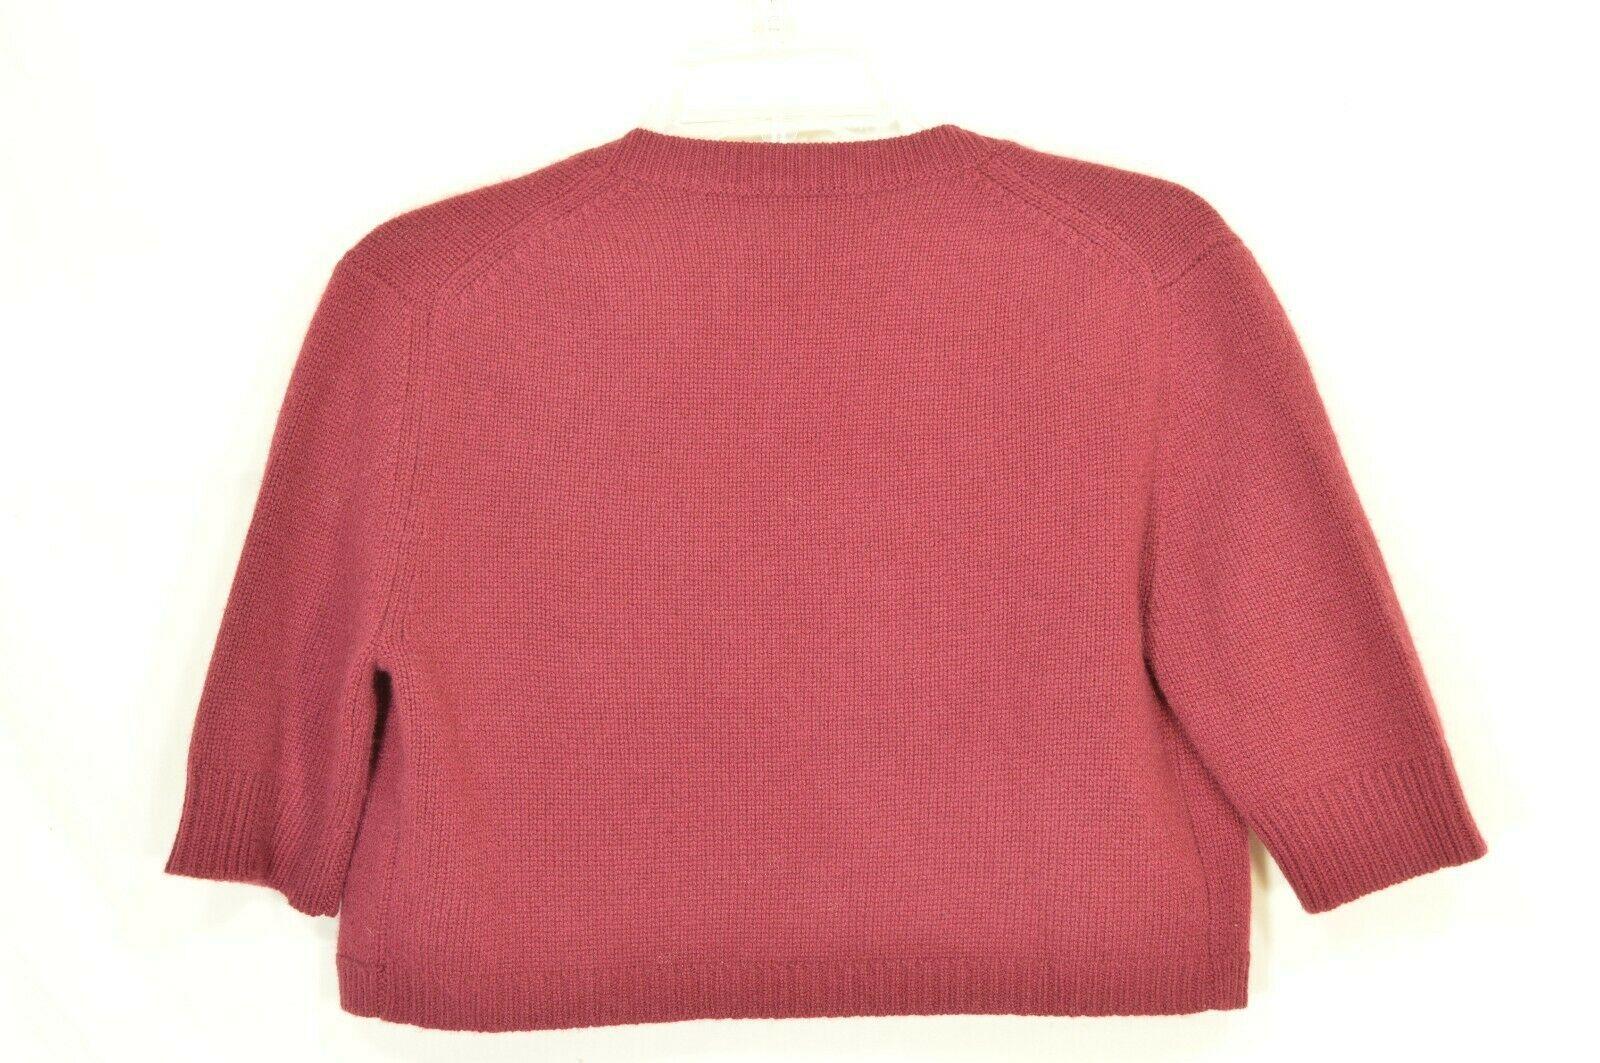 Neiman Marcus sweater M NWT red 100% cashmere shrug bolero cropped $195 new image 5